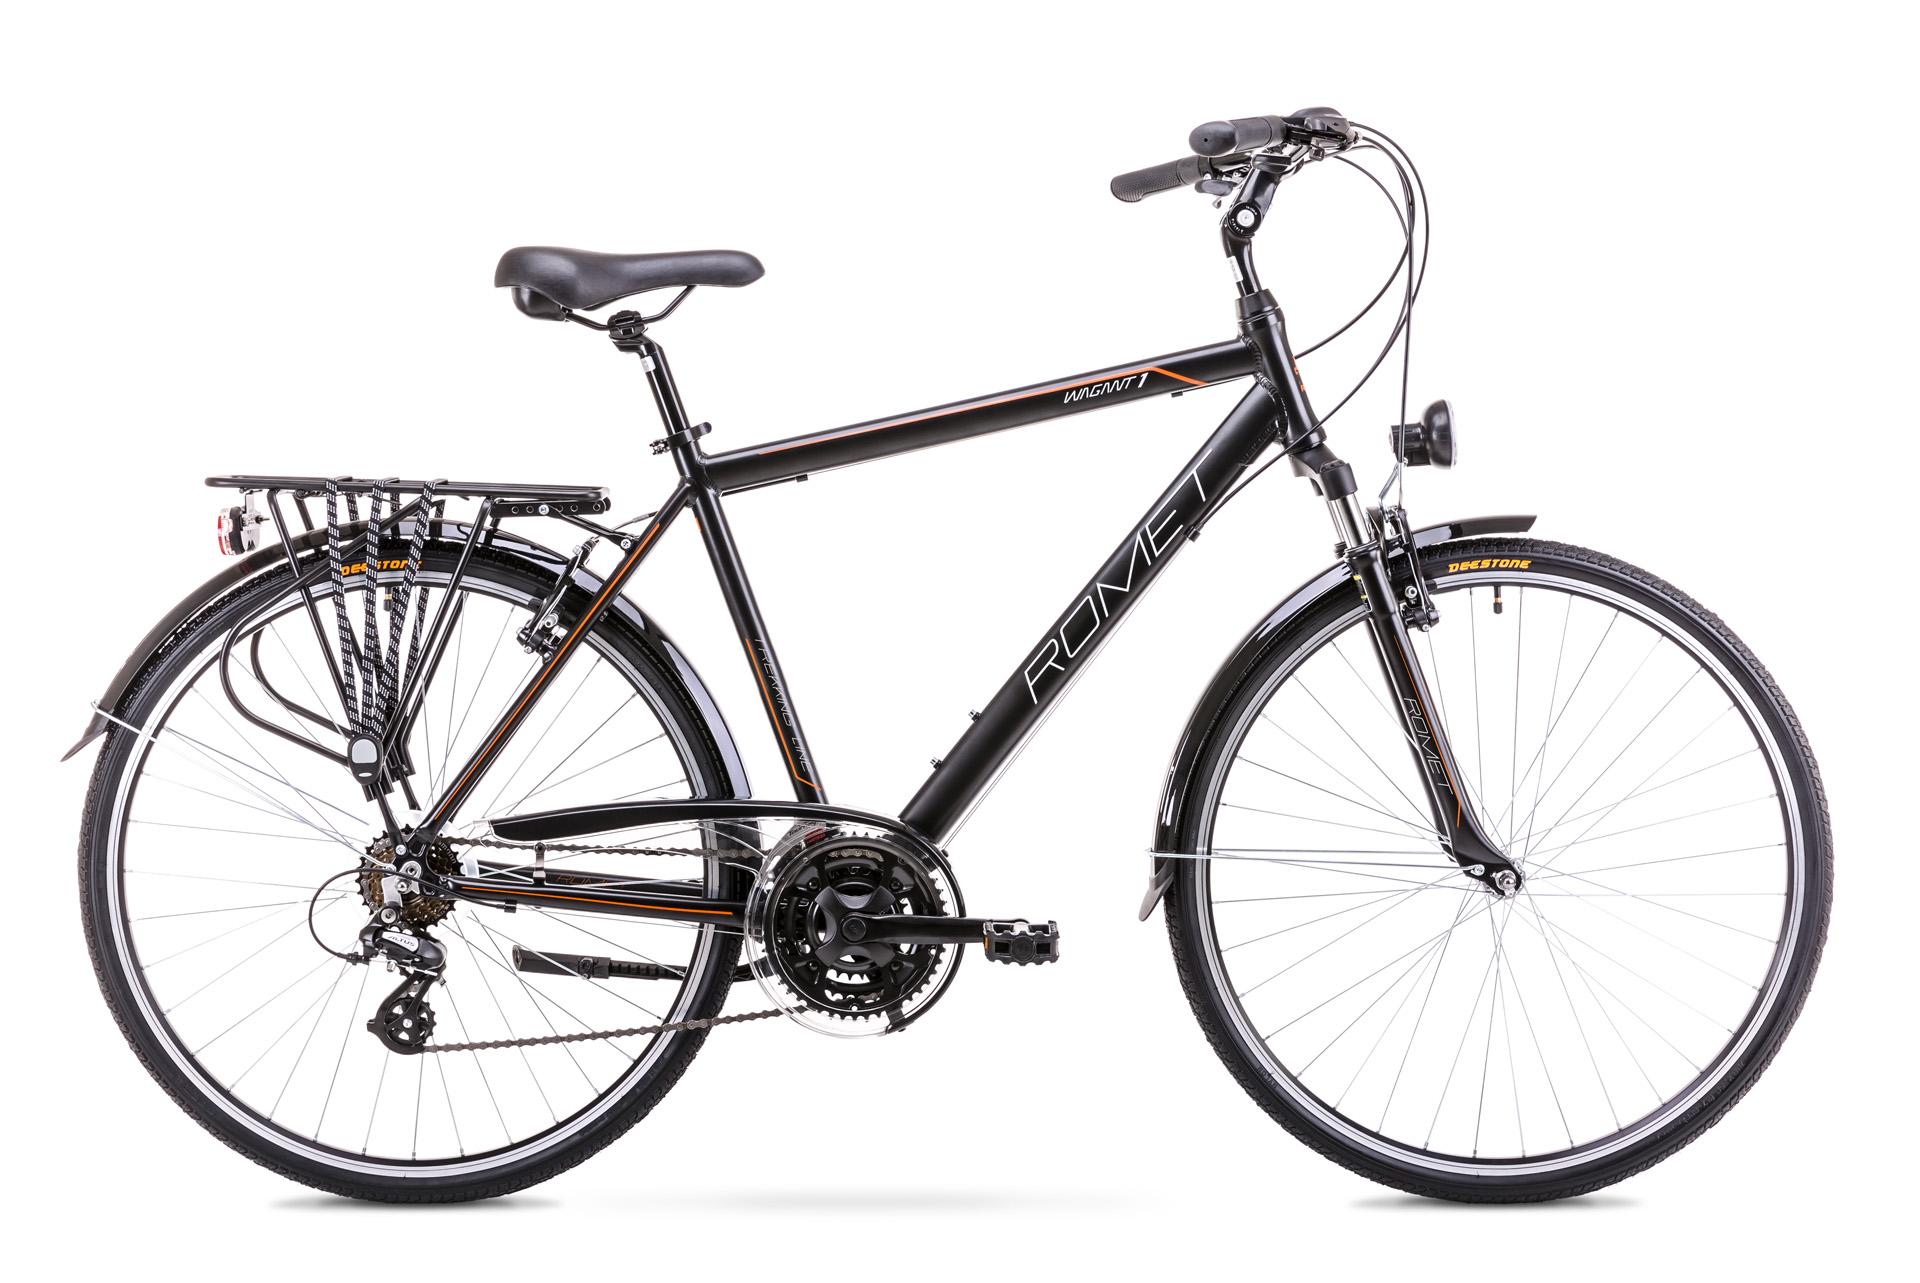 ROMET WAGANT 1 2019 férfi trekking túra kerékpár